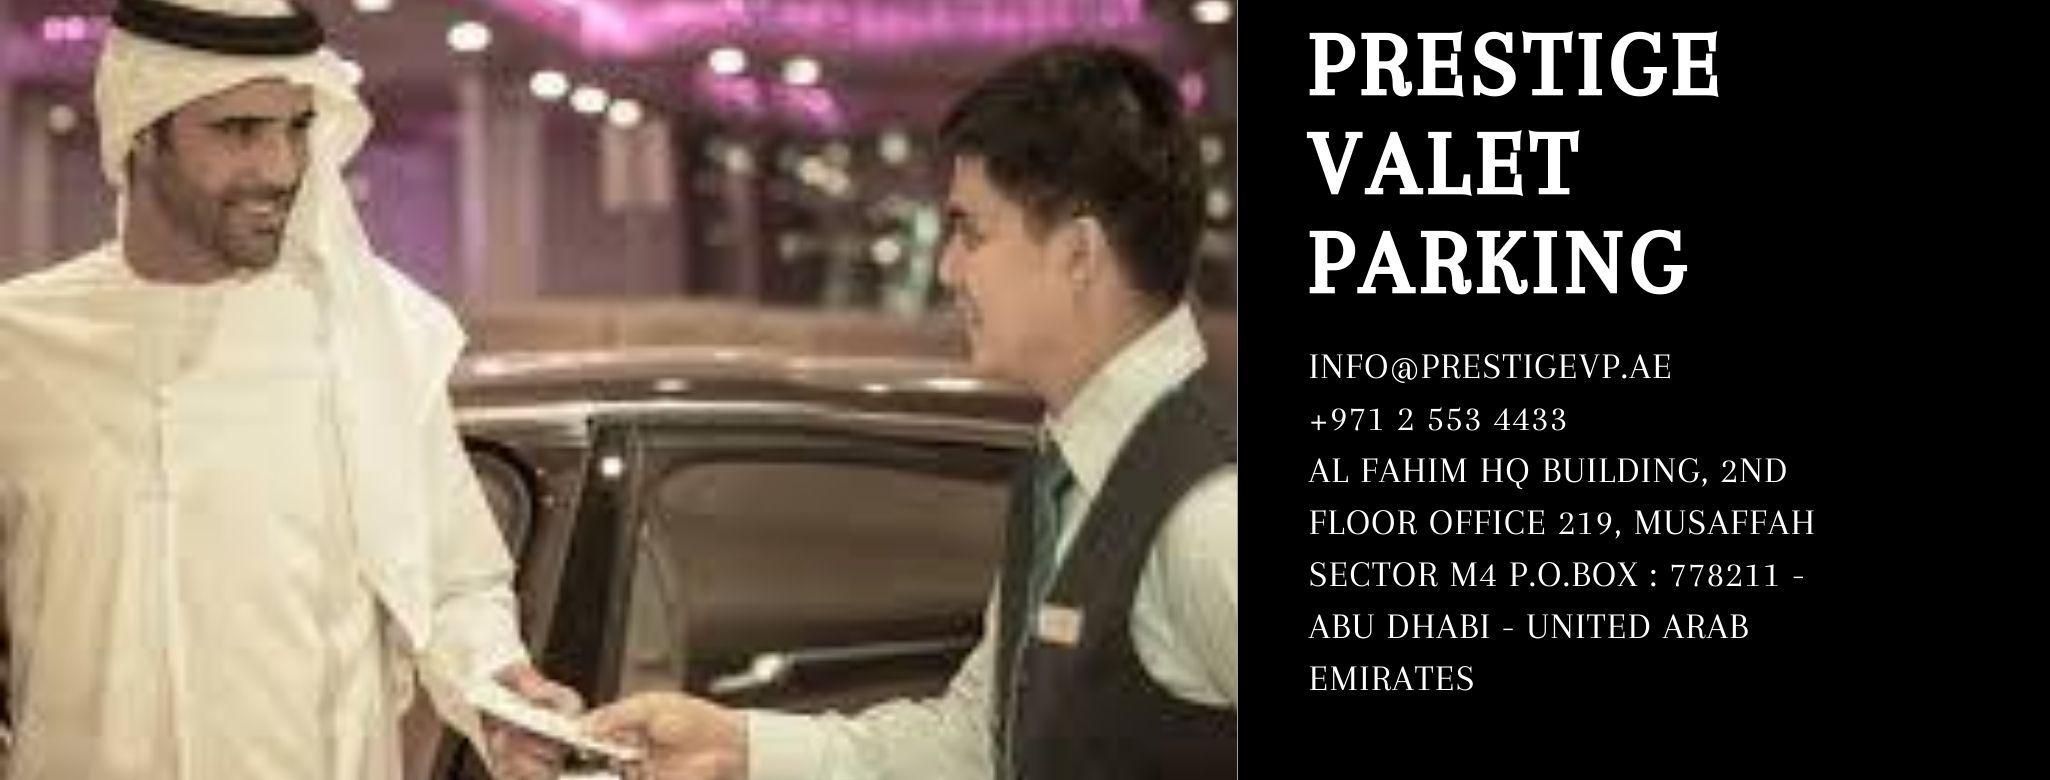 casino valet parking salary